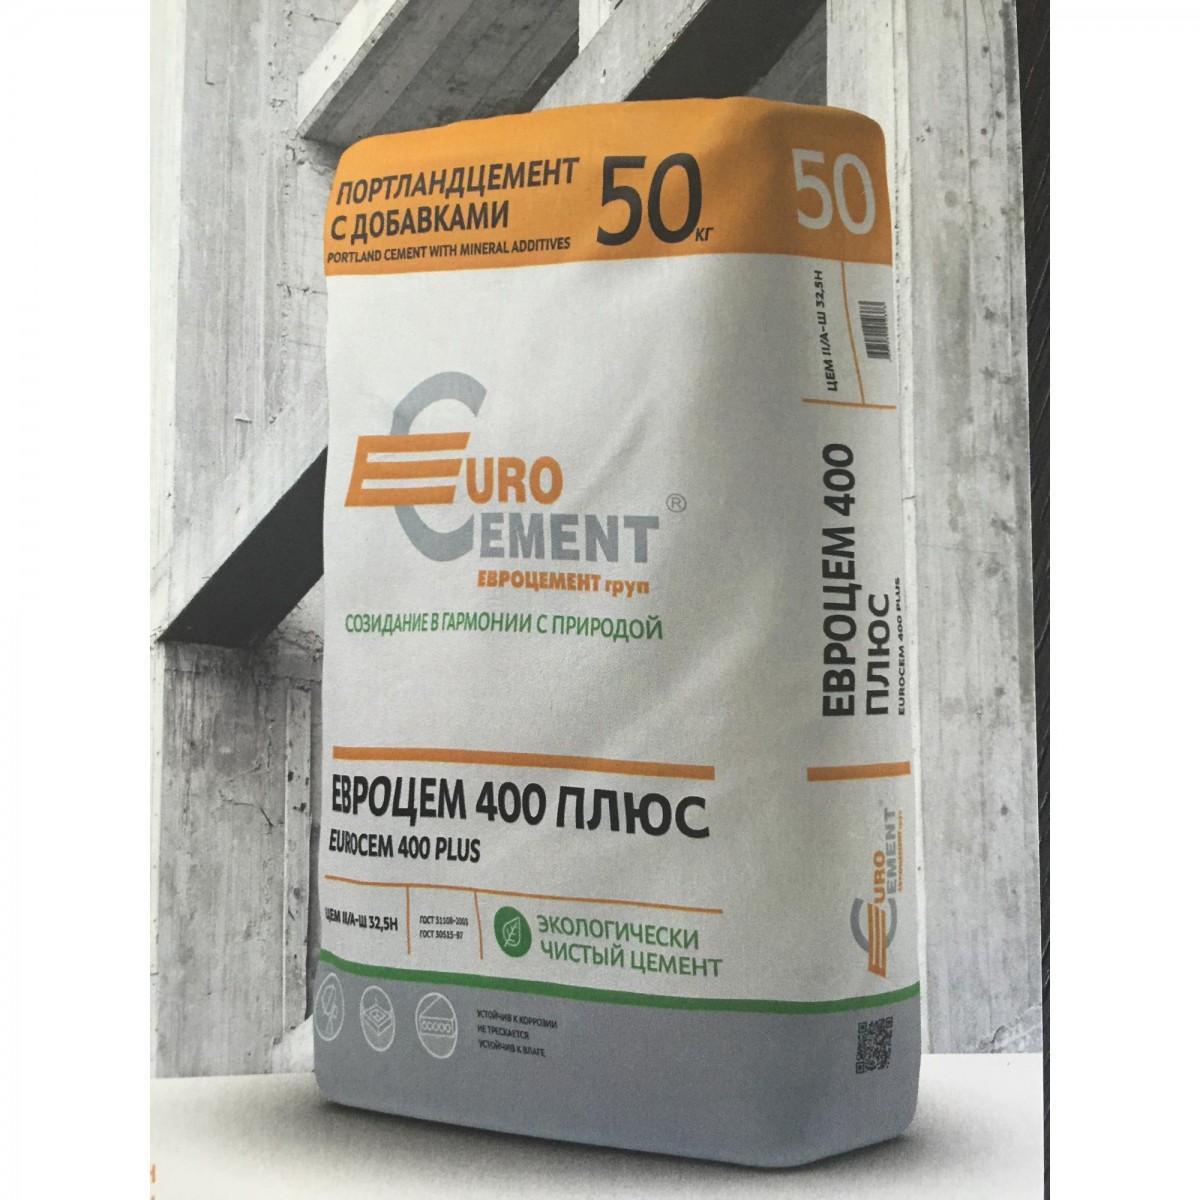 цена цемента м400 в мешках